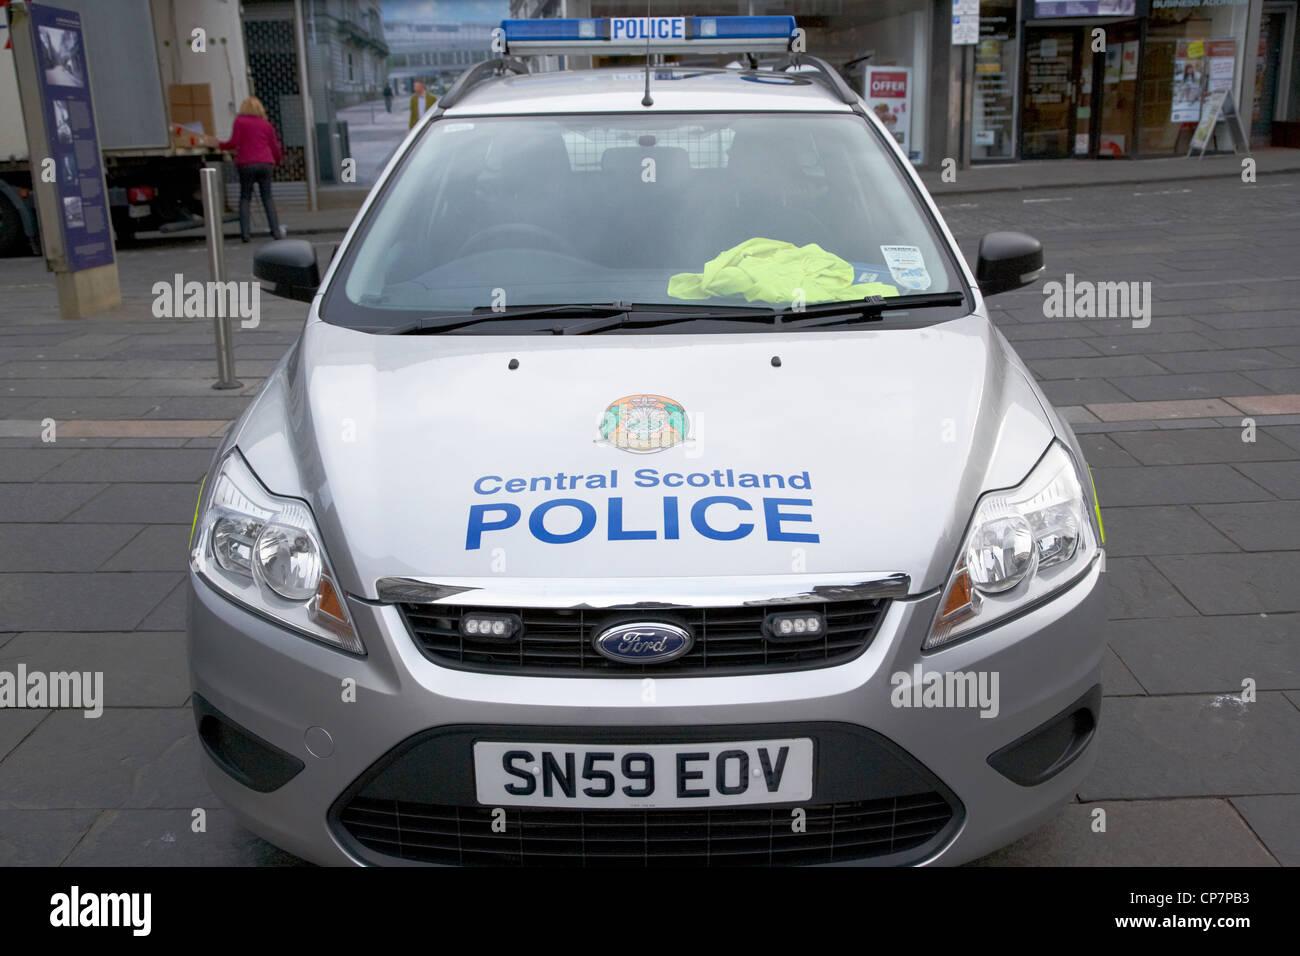 central scotland police force patrol car stirling Scotland UK - Stock Image